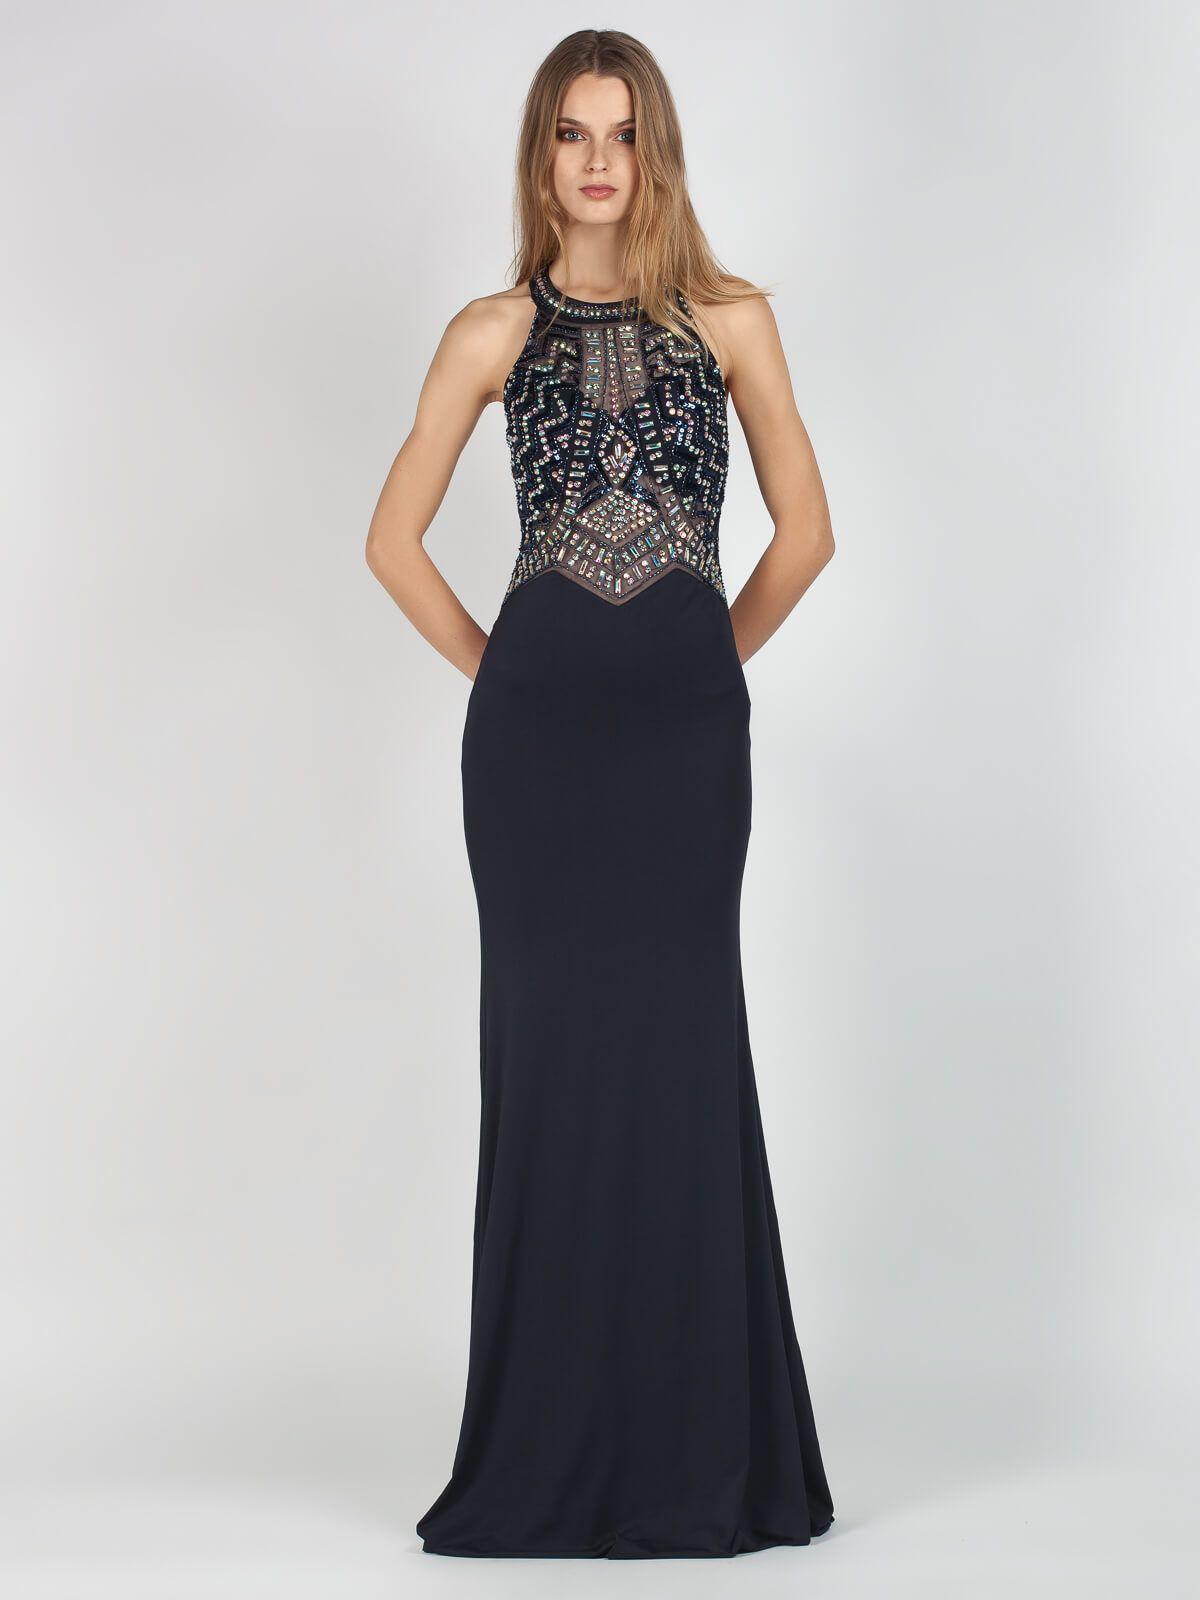 93d76b08d43 Μαύρο Βραδινό Μάξι Φόρεμα με Στρας | Flirt In Fashion | Το φόρεμα ...